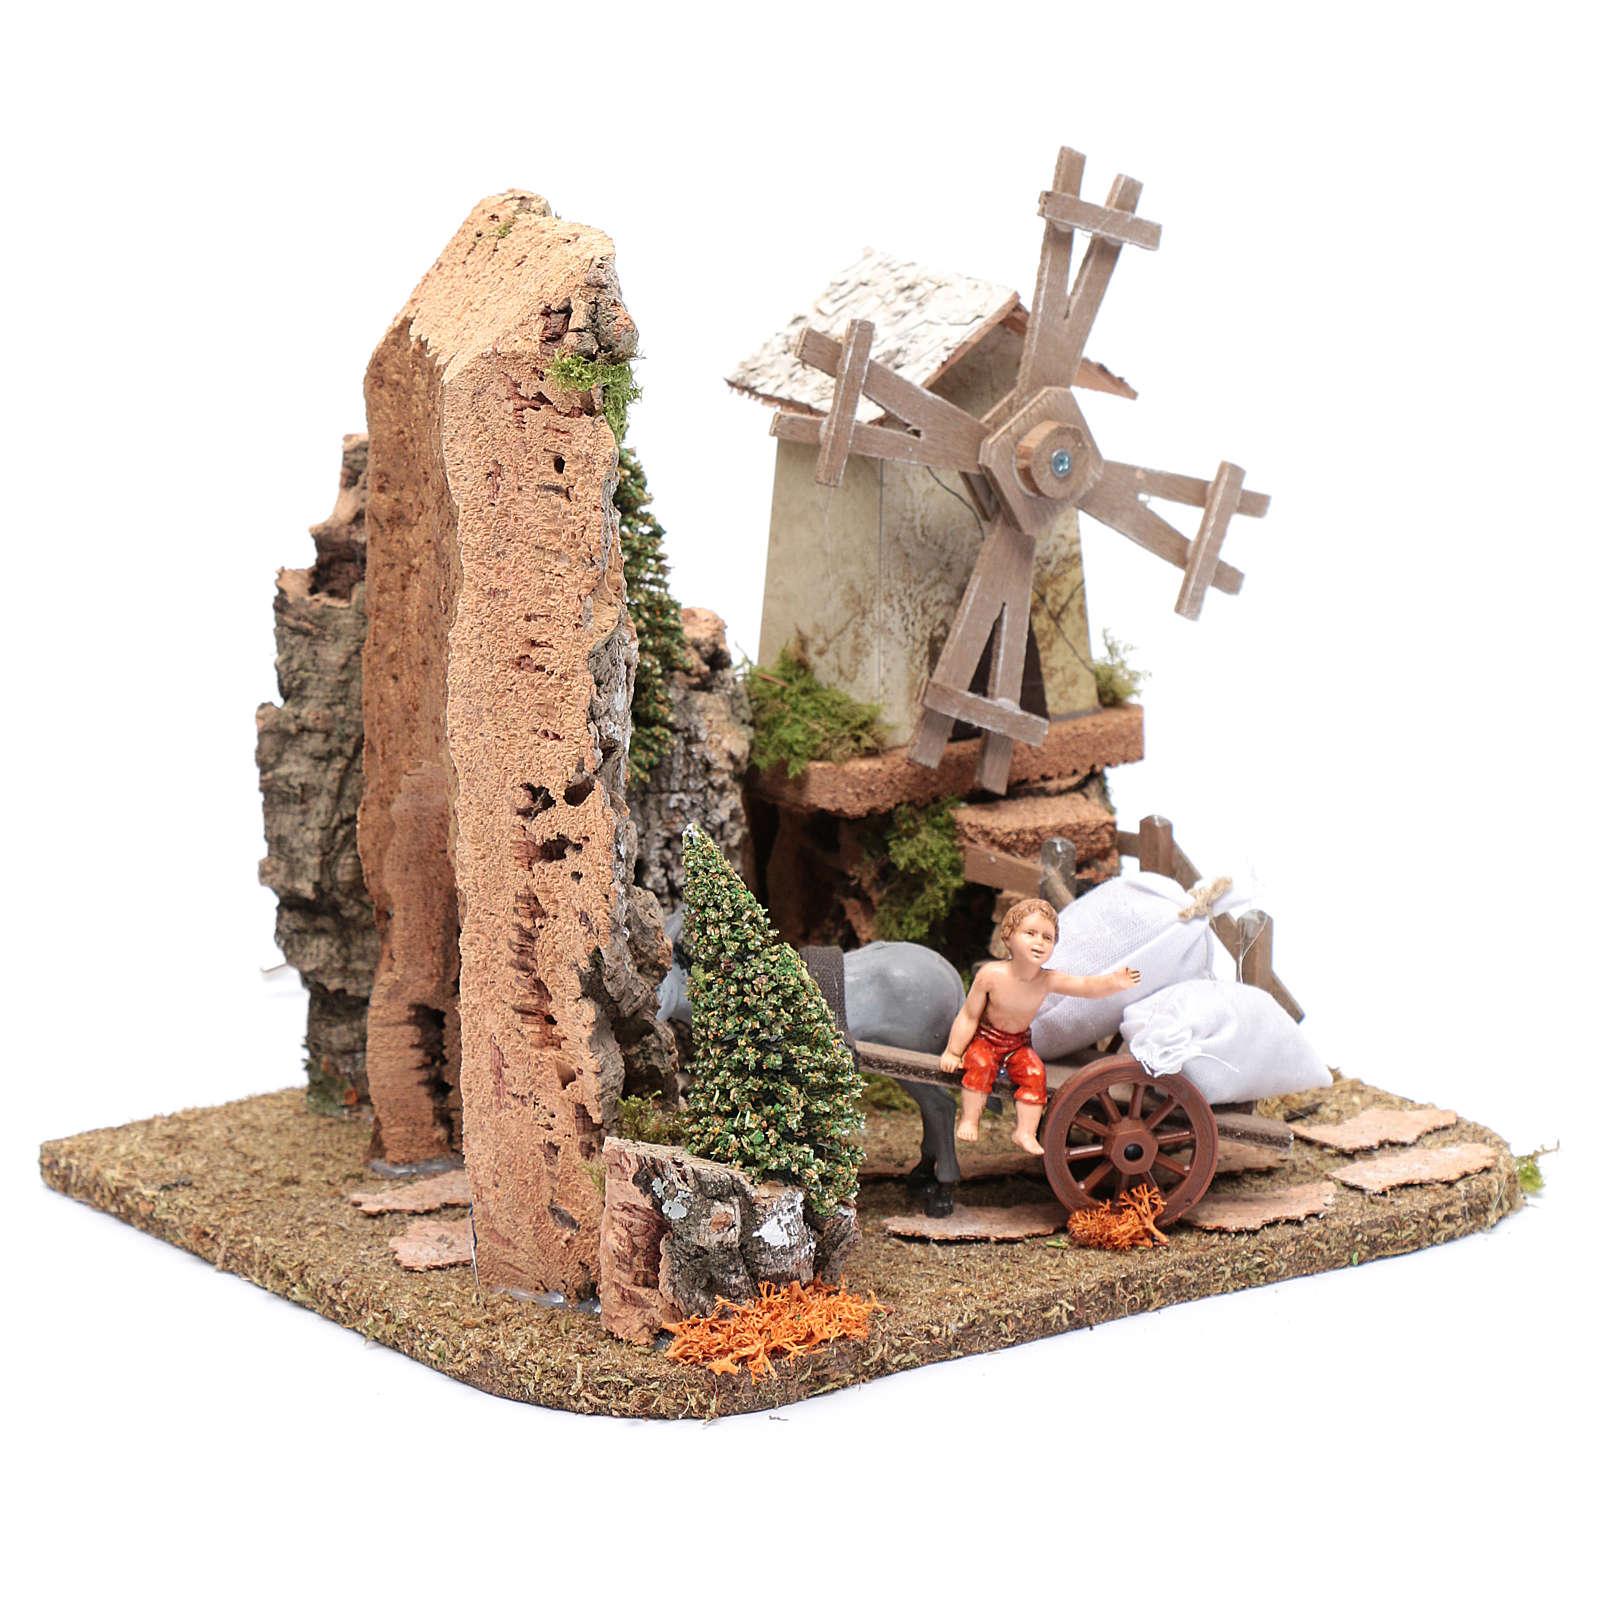 Nativity scene windmill with cart 20x25x20 cm 4